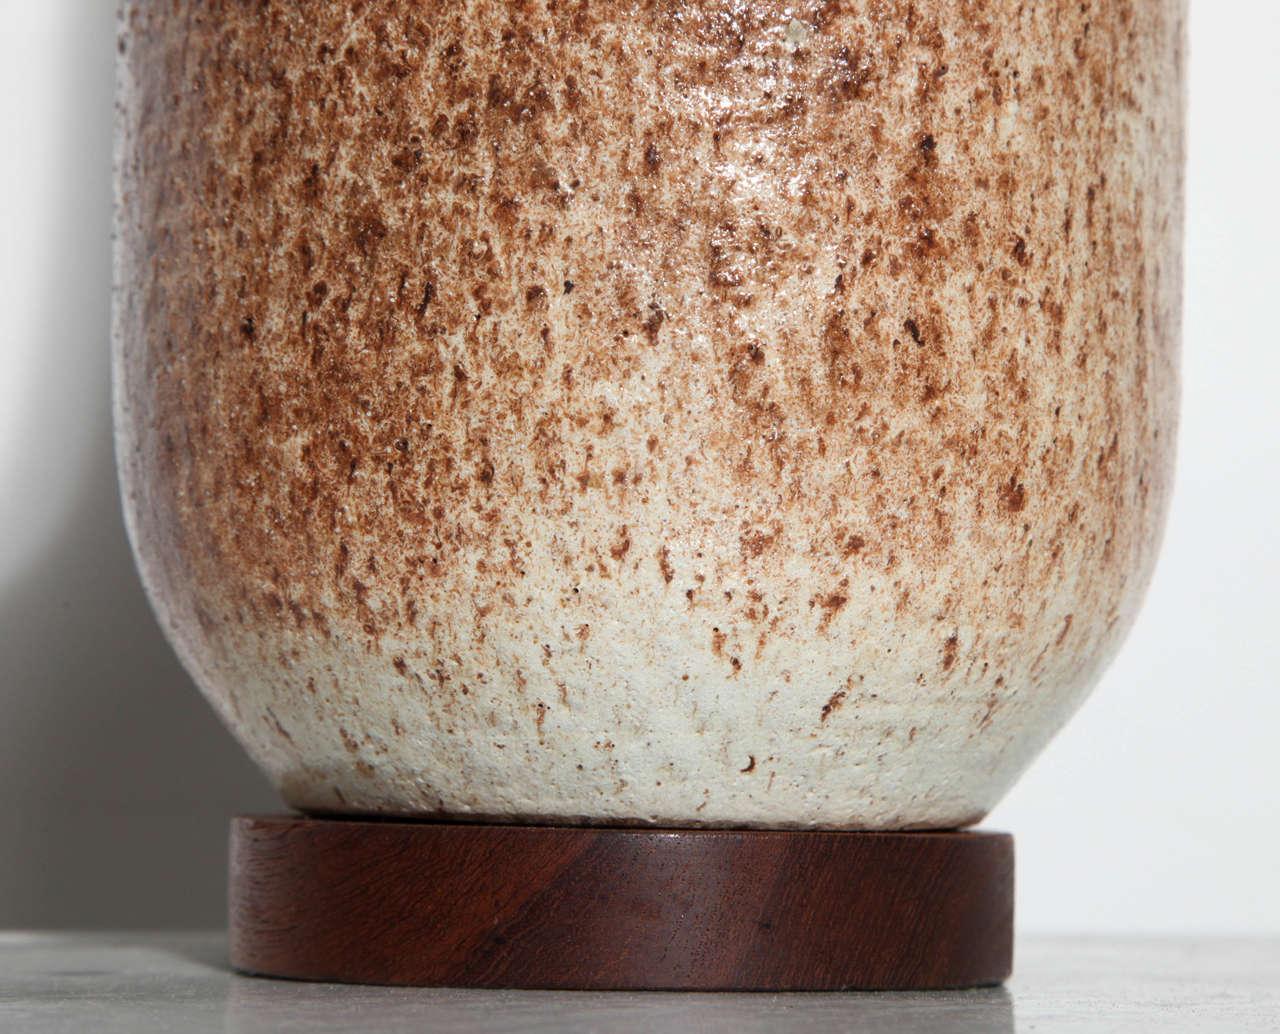 Mid-20th Century Tall David Cressey Earthen California Modern Glazed Ceramic Table Lamp, C. 1960s For Sale